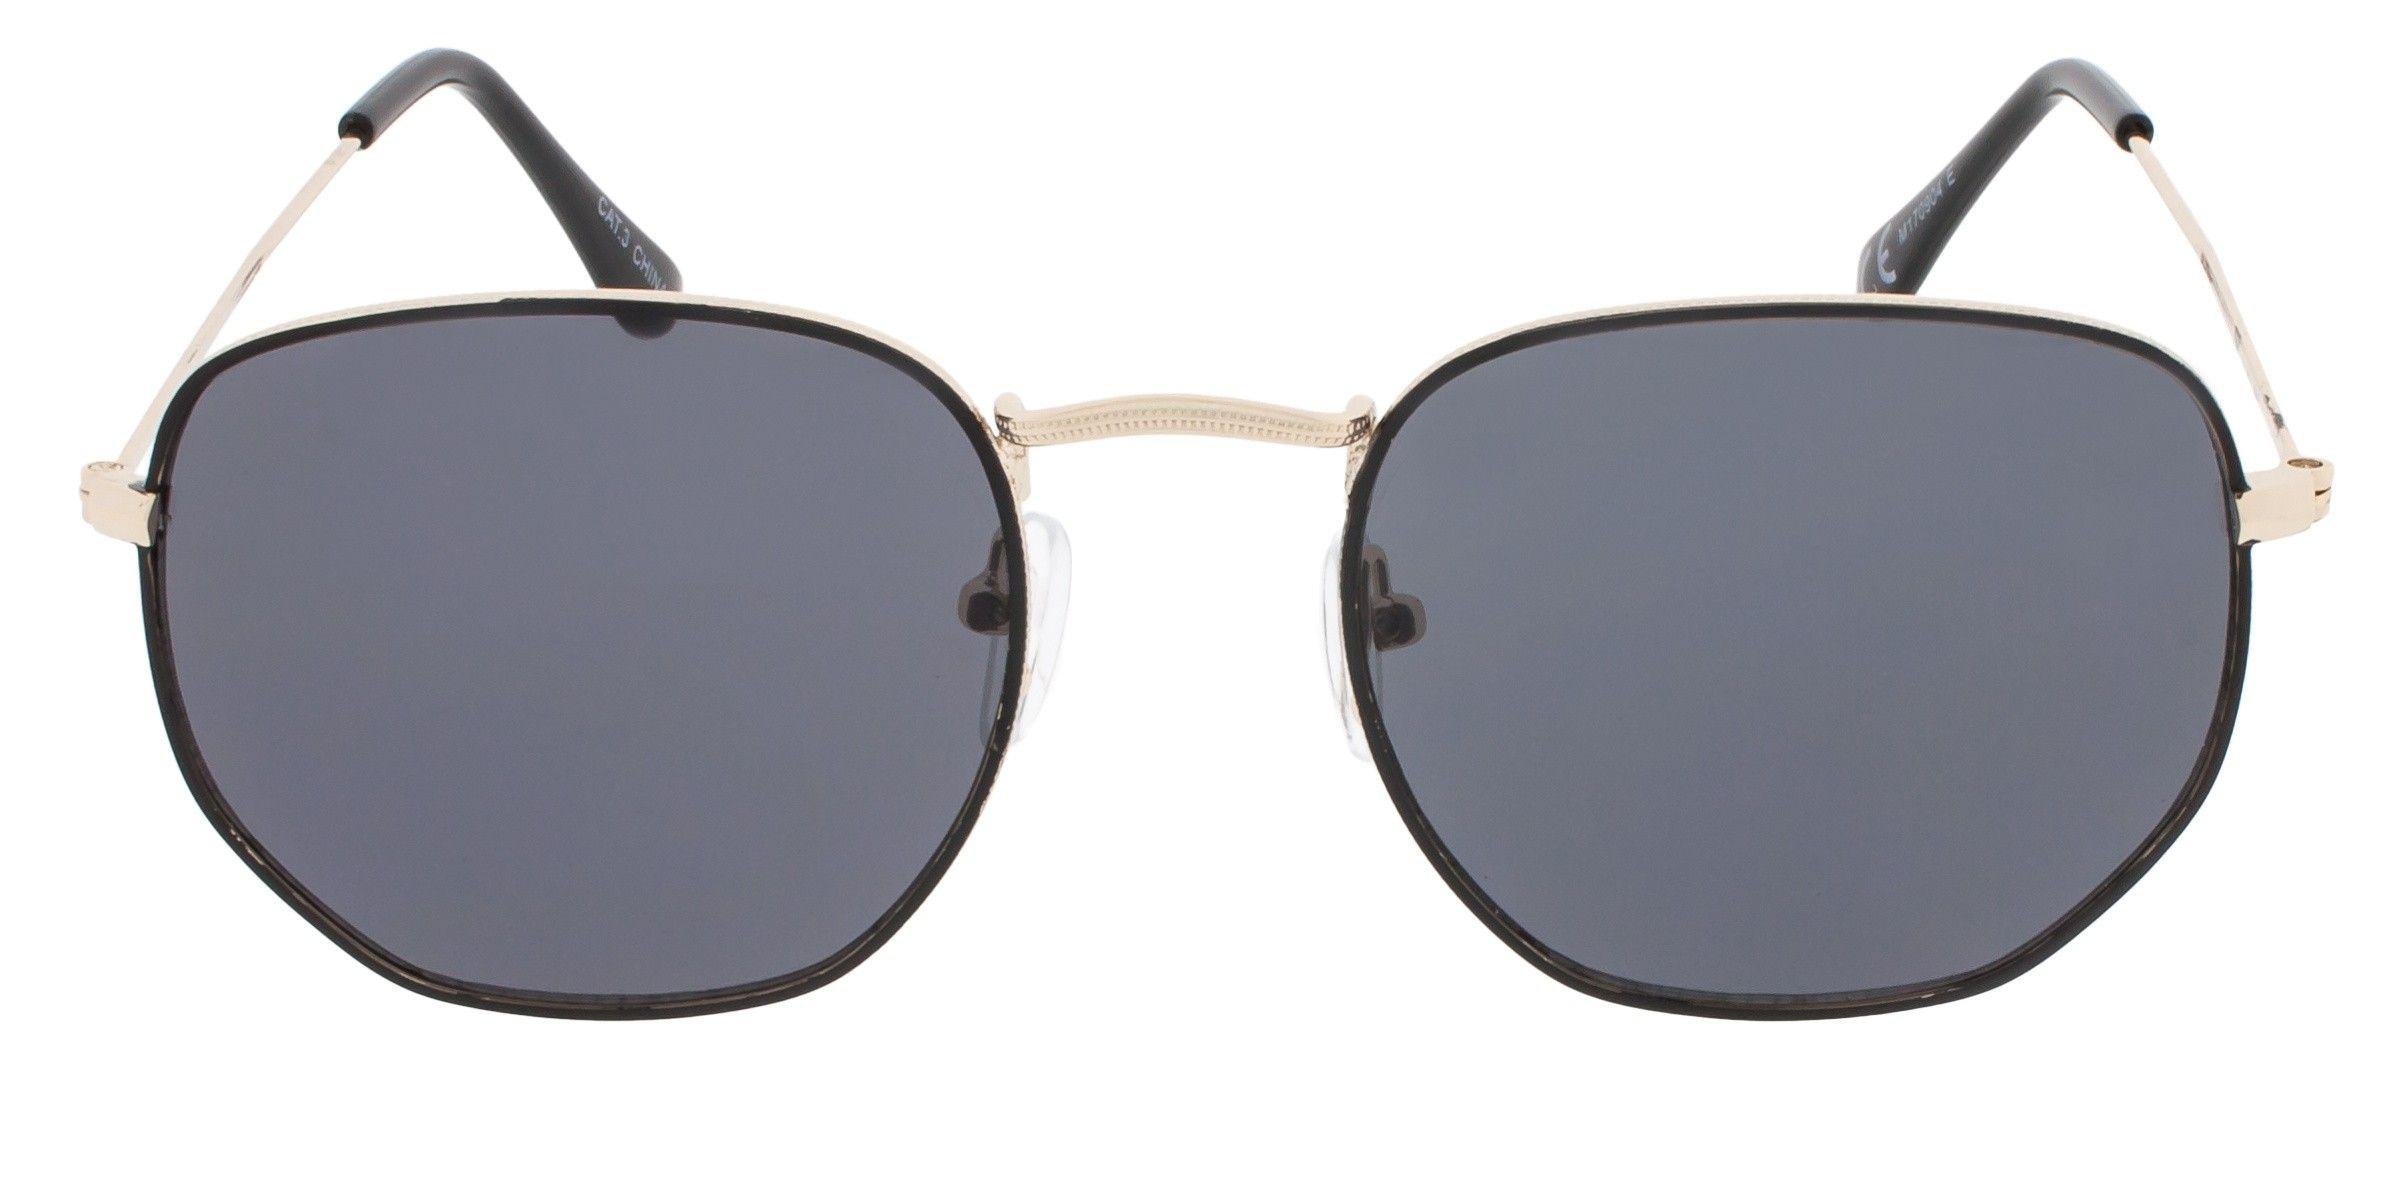 Afbeelding van Icon Eyewear M170904 E Zonnebril Black / Gold